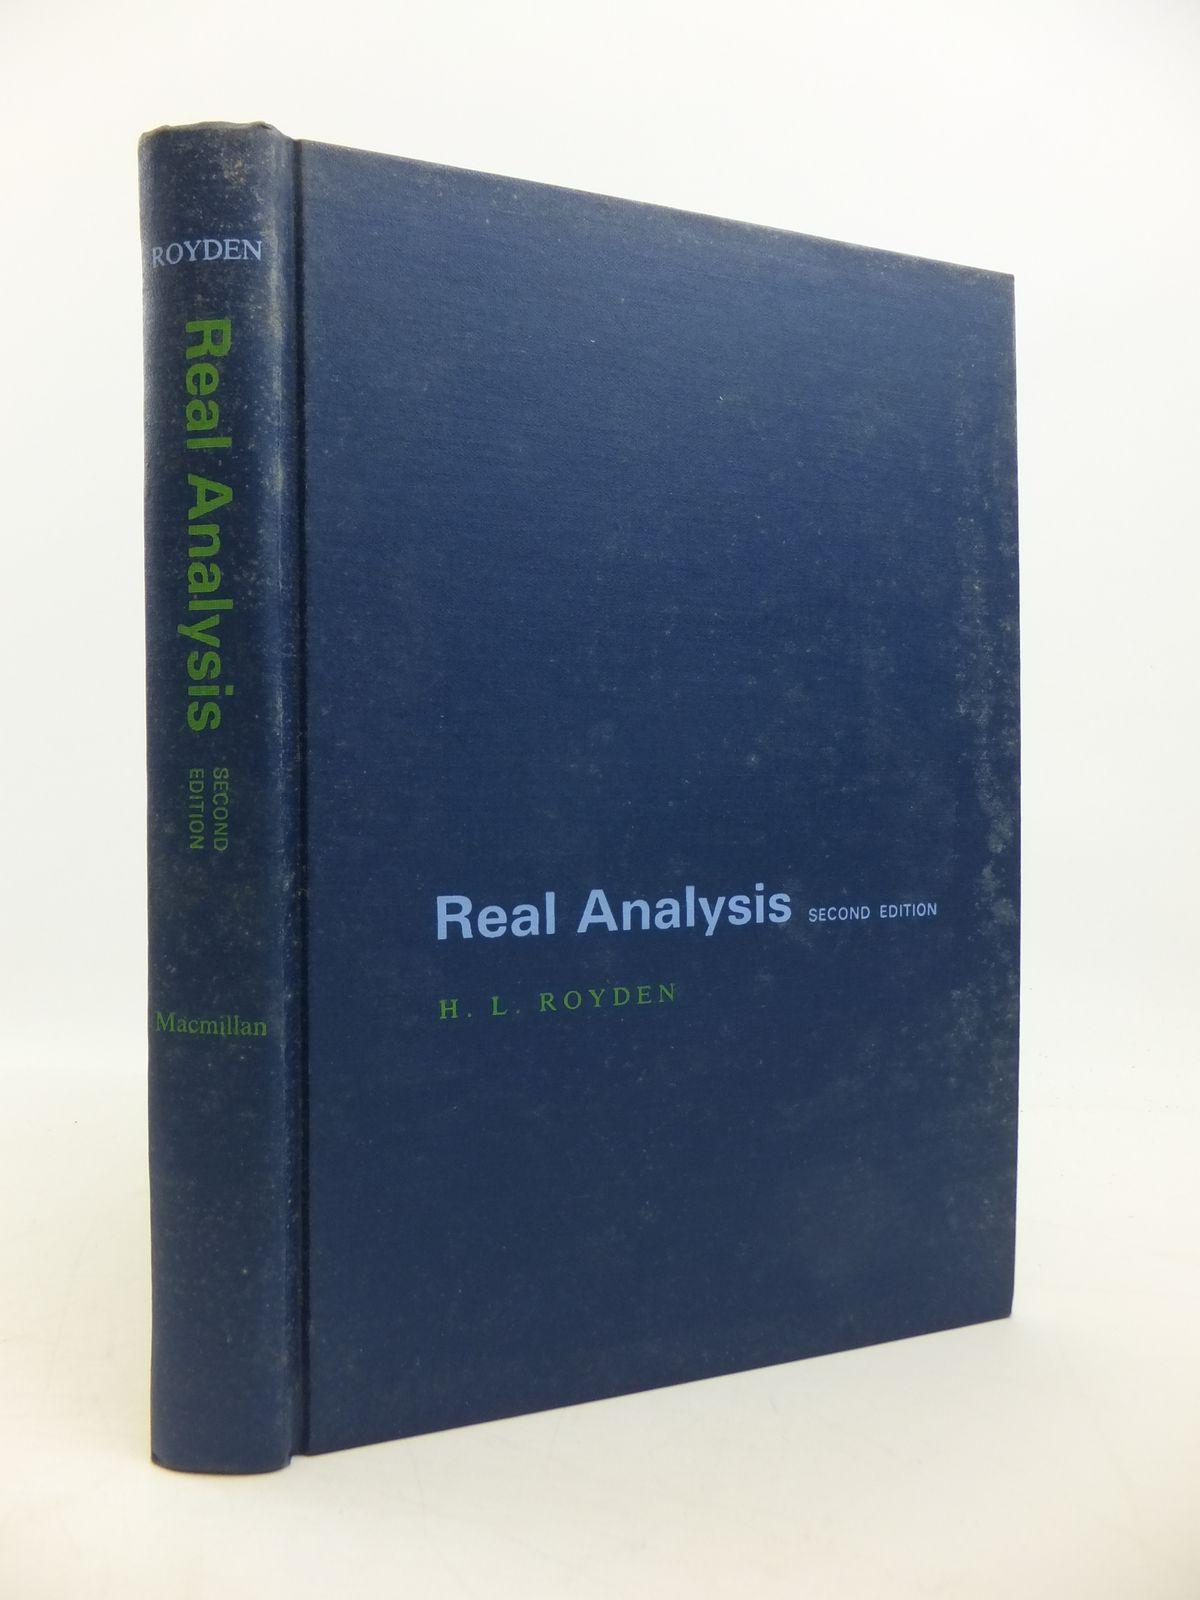 REAL ANALYSIS written by Royden, H L , STOCK CODE: 1811520 : Stella